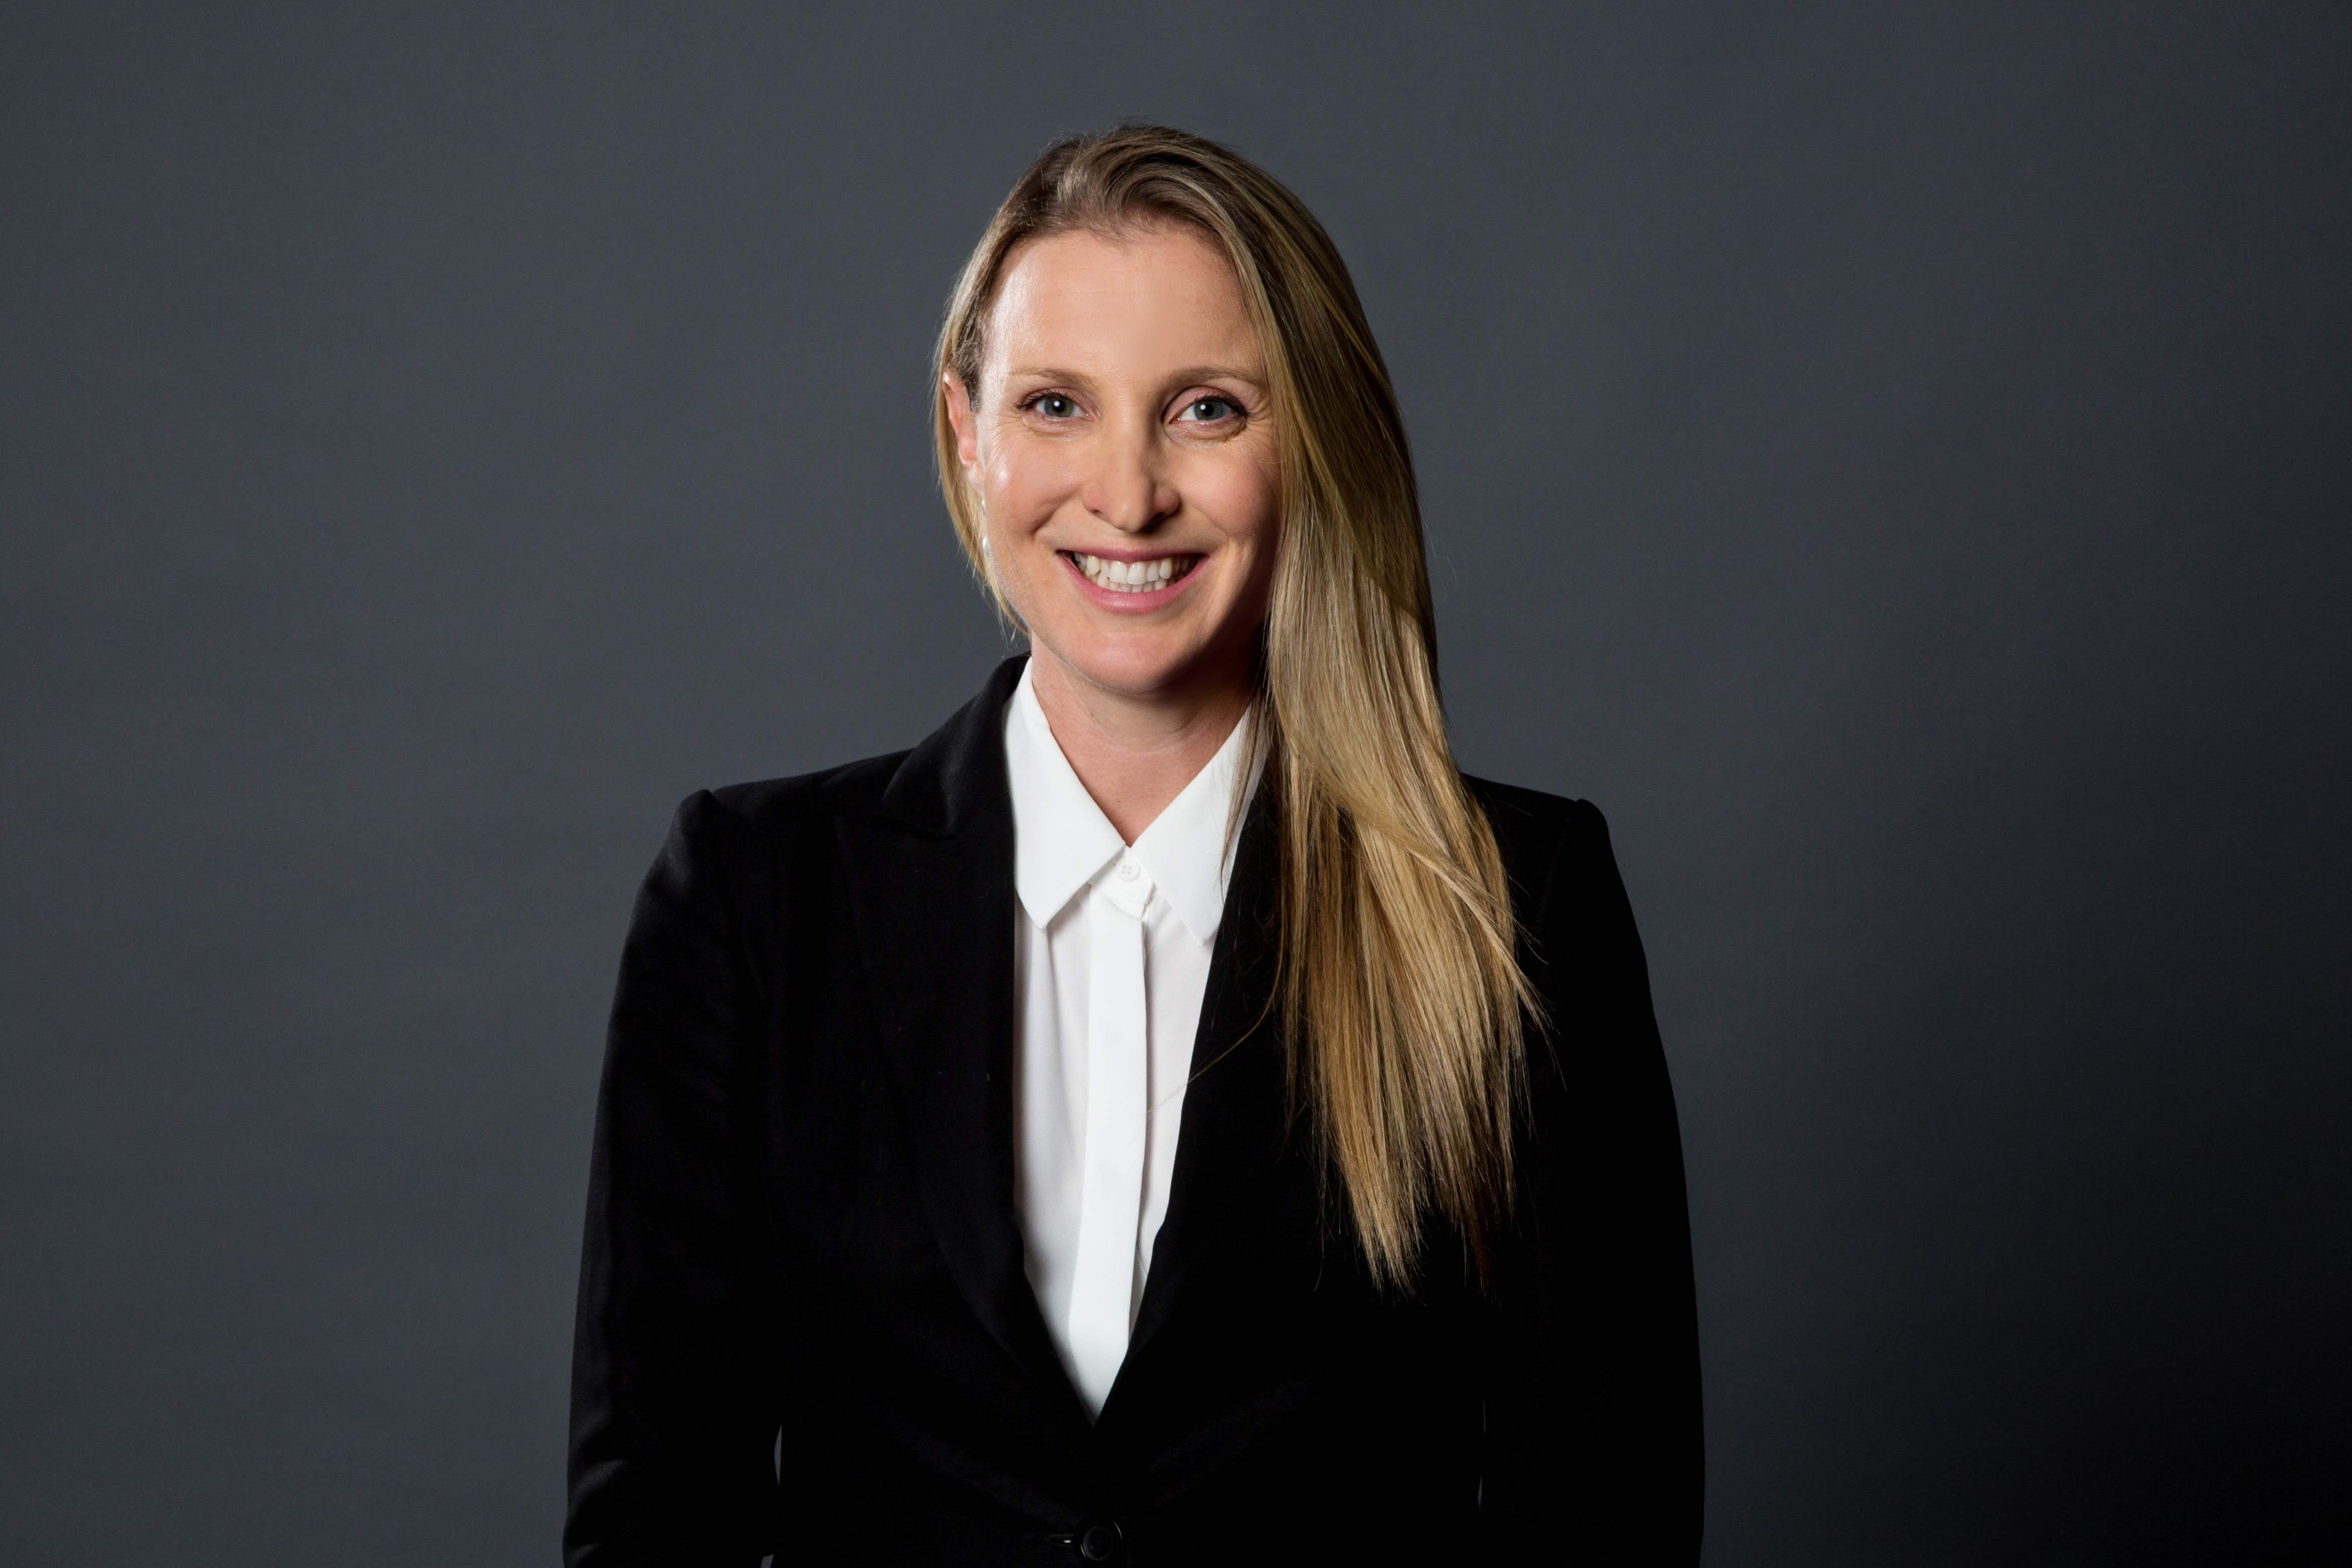 Kate Marr, Managing Director